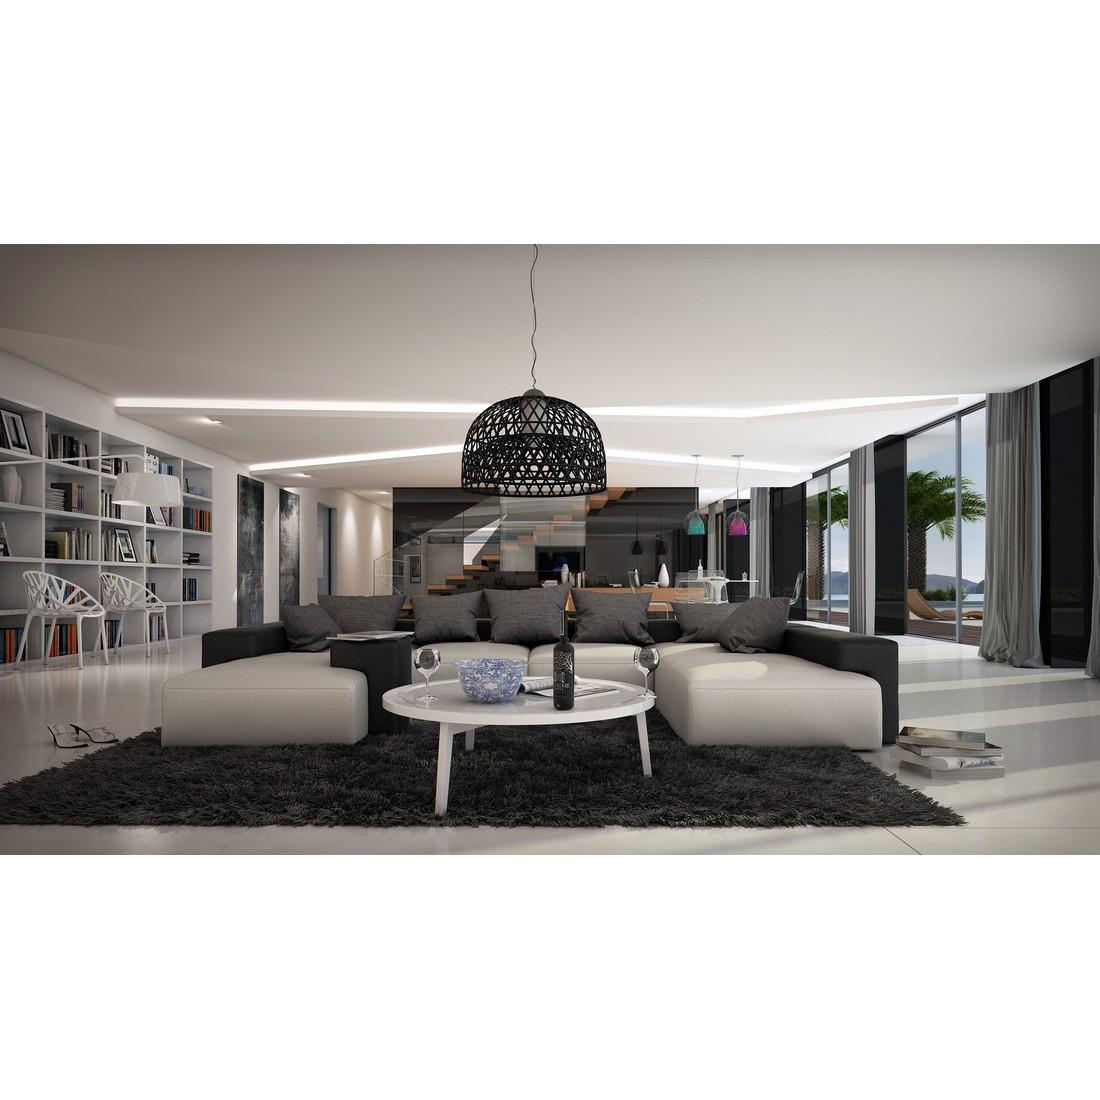 Polstersofa Saheel – U-Form – Ausführung: Ottomane Links, Sofa Dreams online bestellen